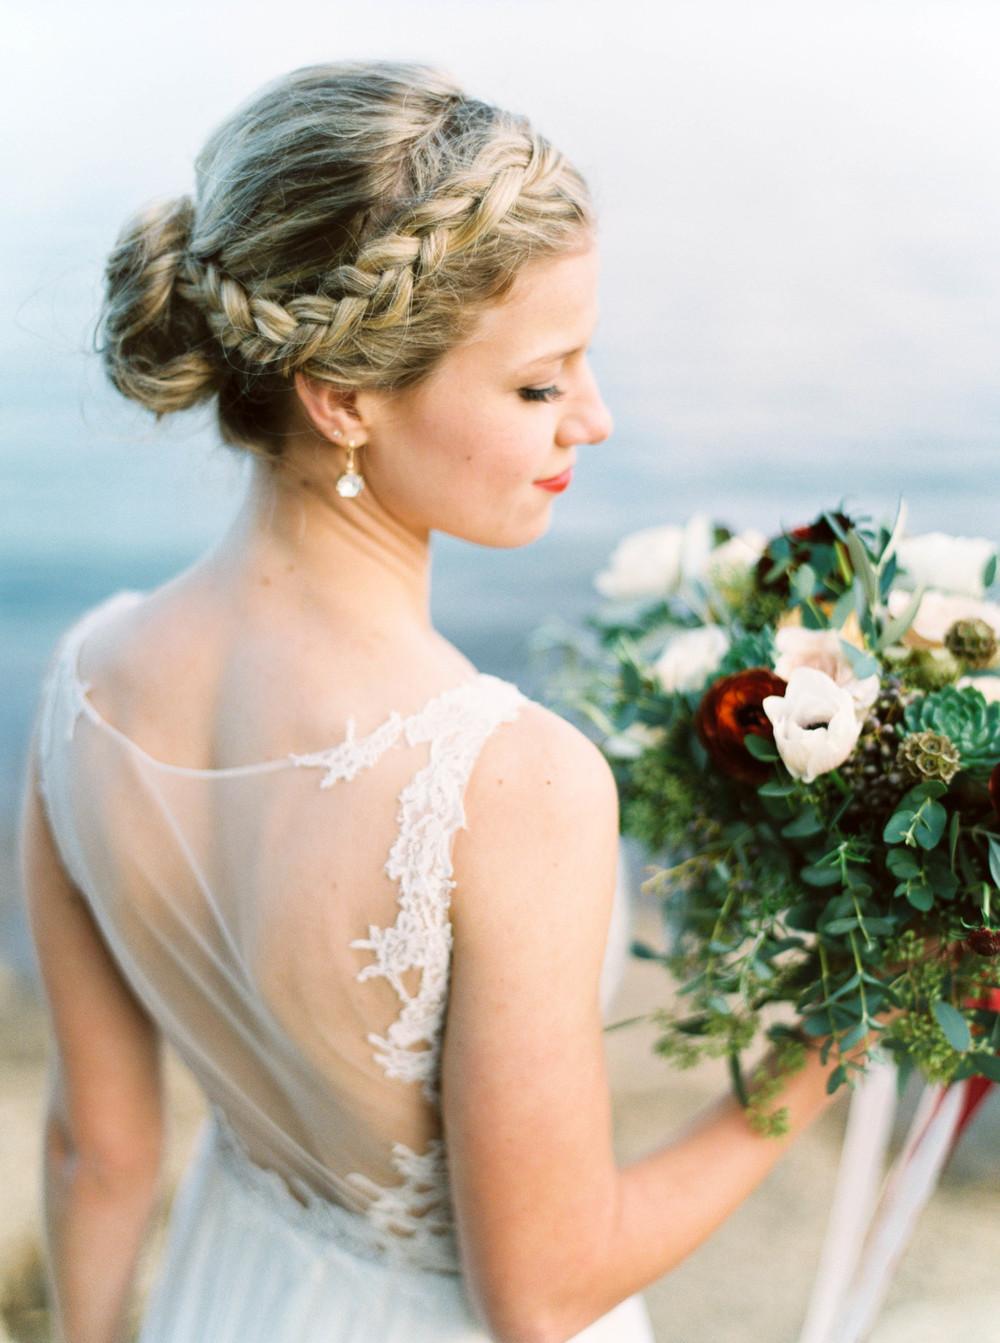 Sheer back wedding dress // Lush bridal bouquet